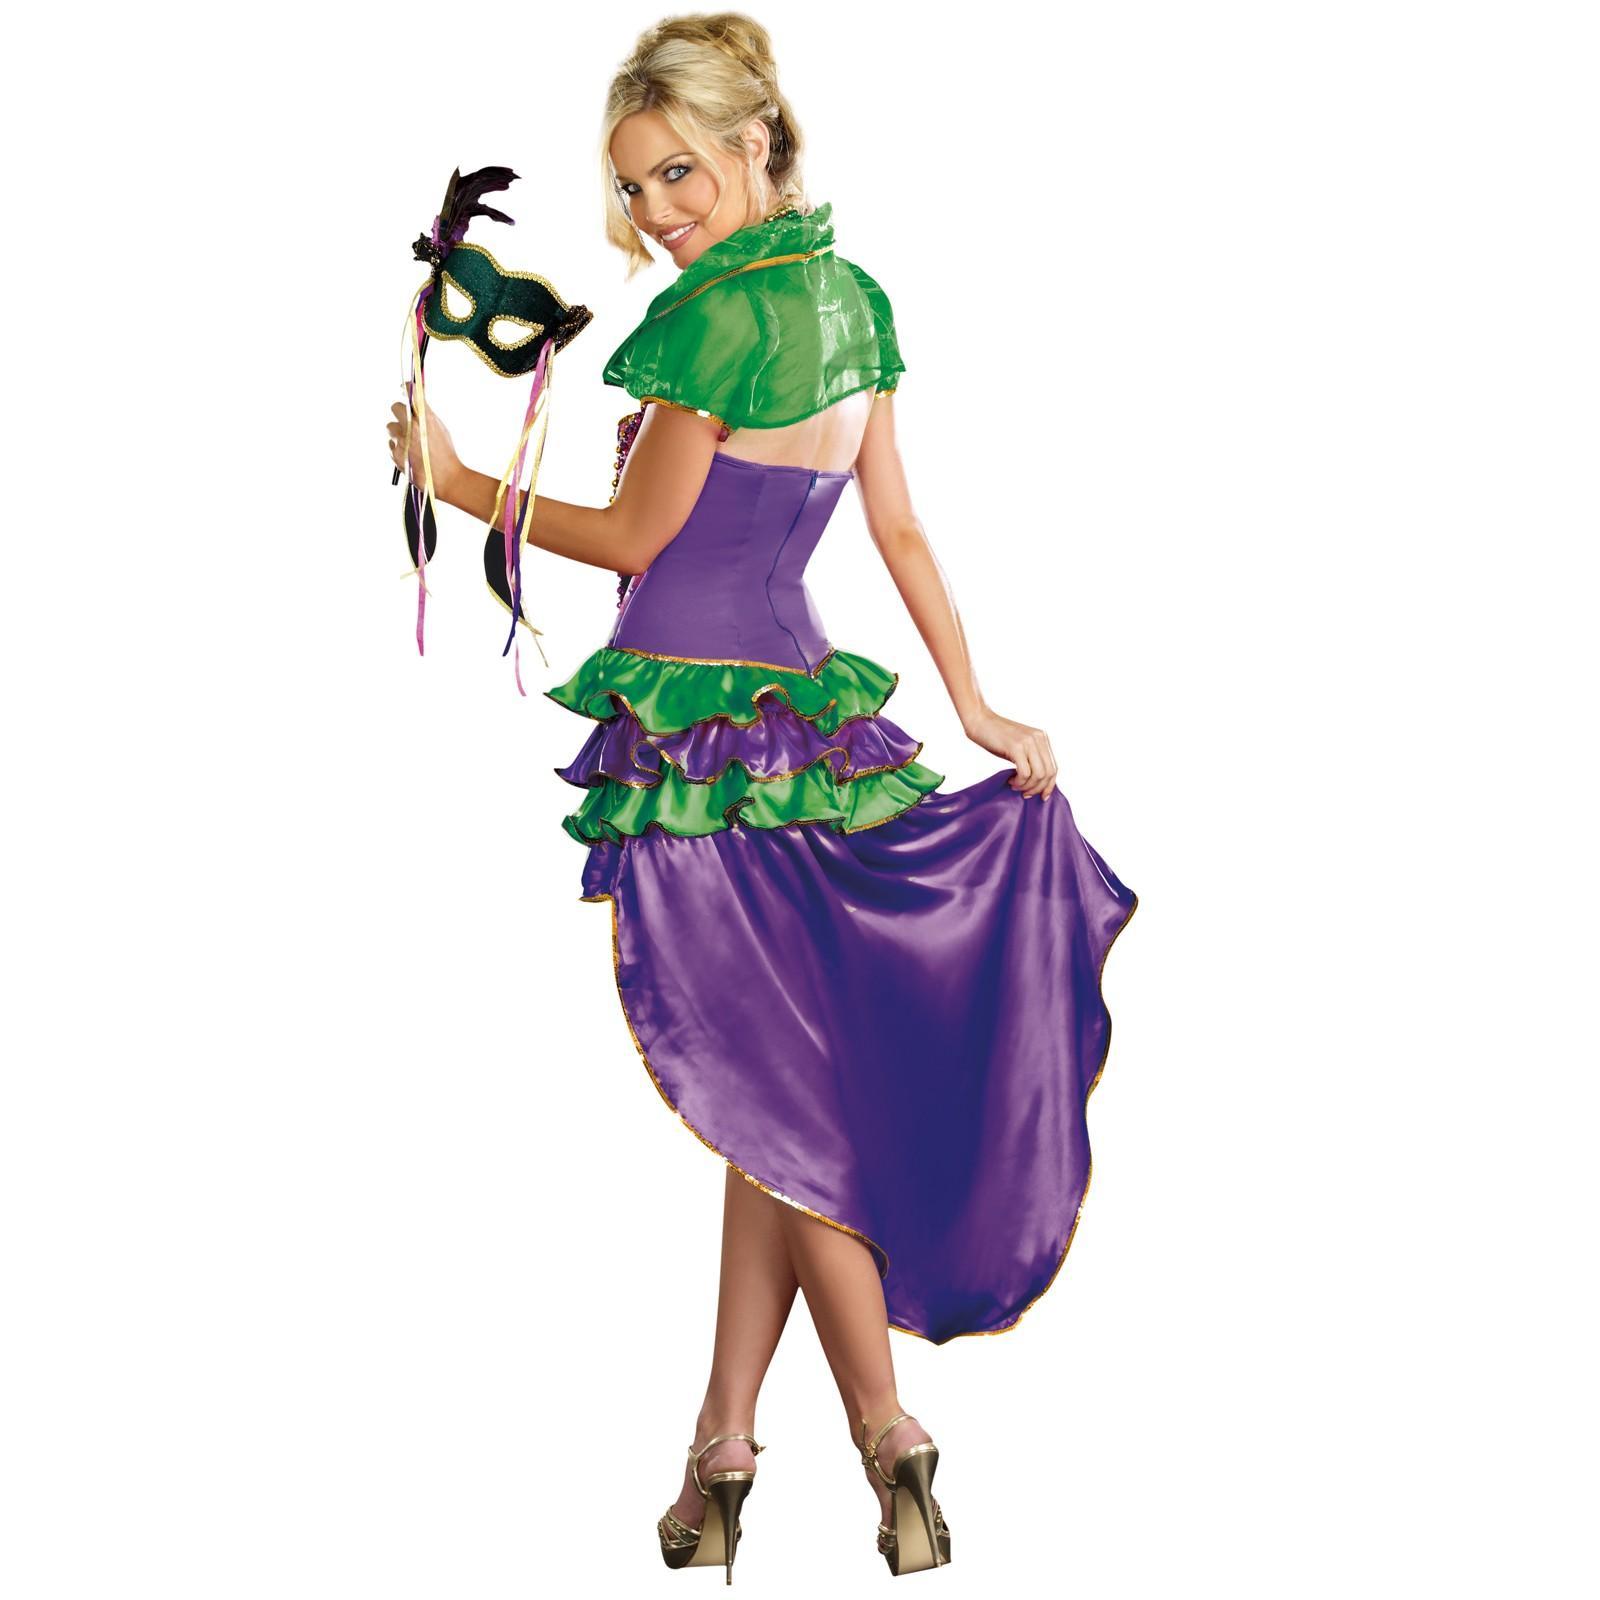 CL284 Mardi Gras Maven Jester Masquerade Ball Queen Parade Party Outfit Costume | eBay